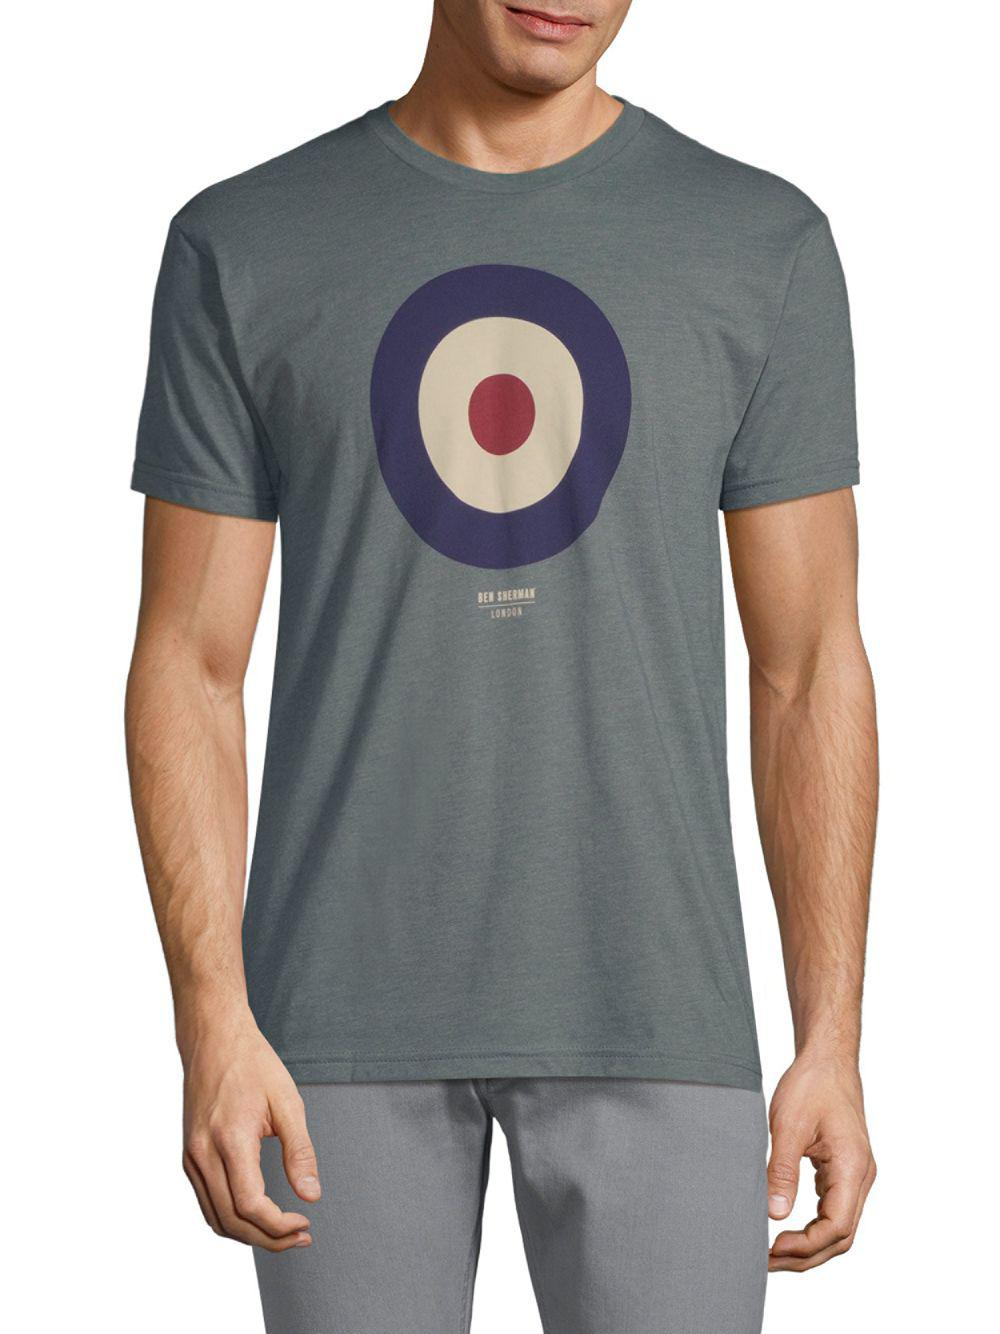 356c453f8 Lyst - Ben Sherman Target Graphic Tee in Blue for Men